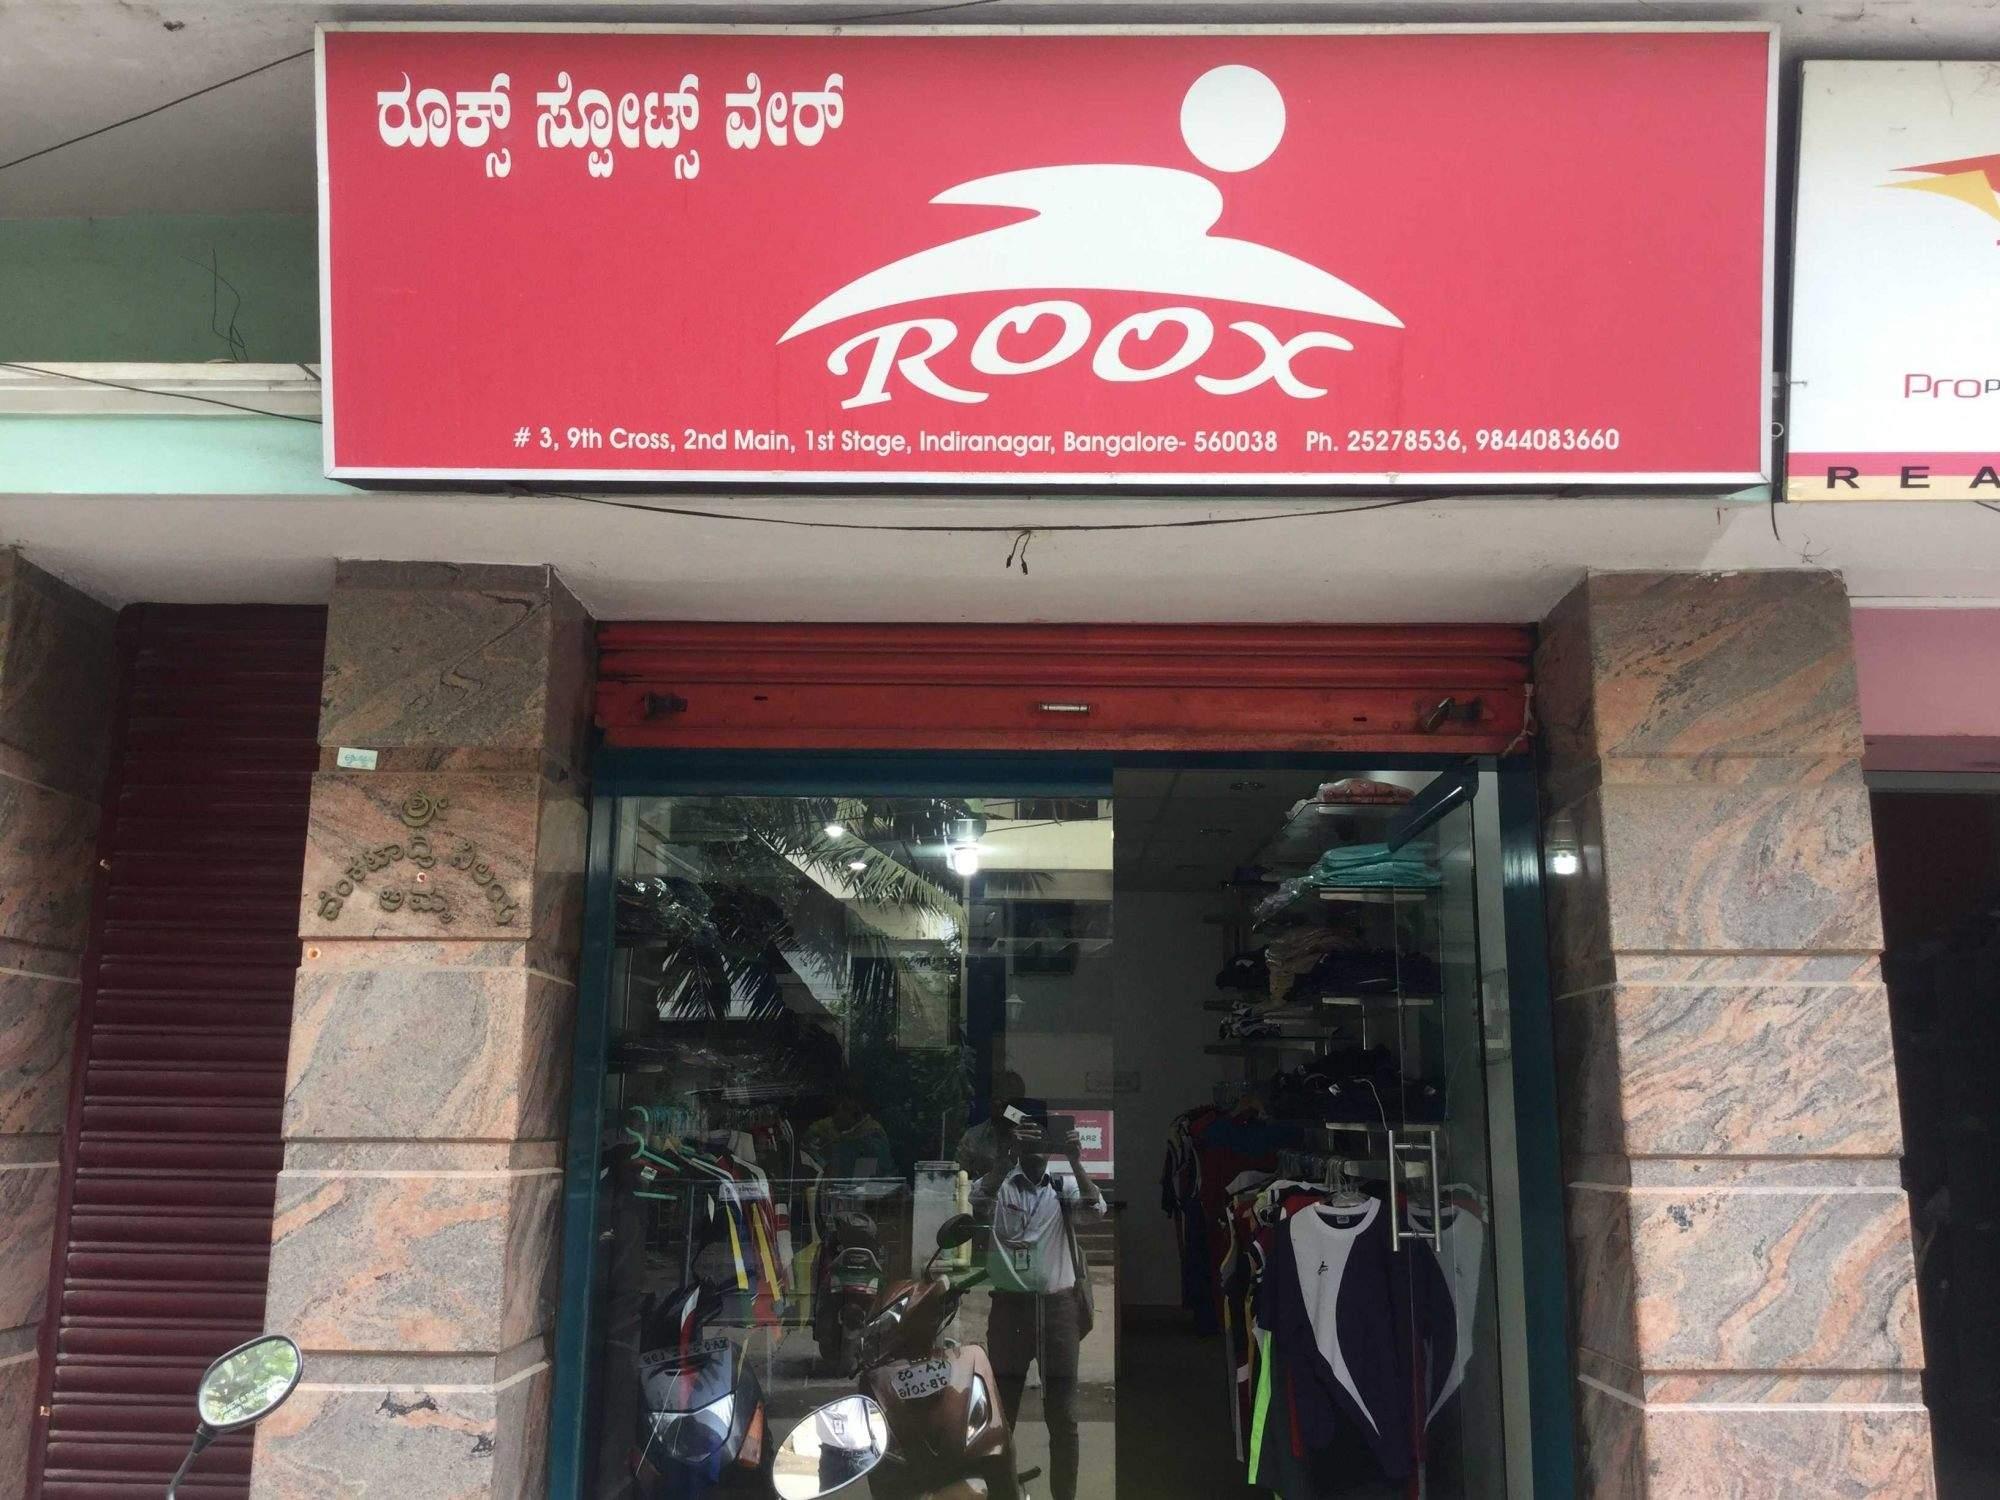 wedding card printers in bangalore indiranagar%0A Roox Sportwear  Indira Nagar  st Stage  Sportswear Manufacturers in  Bangalore  Justdial